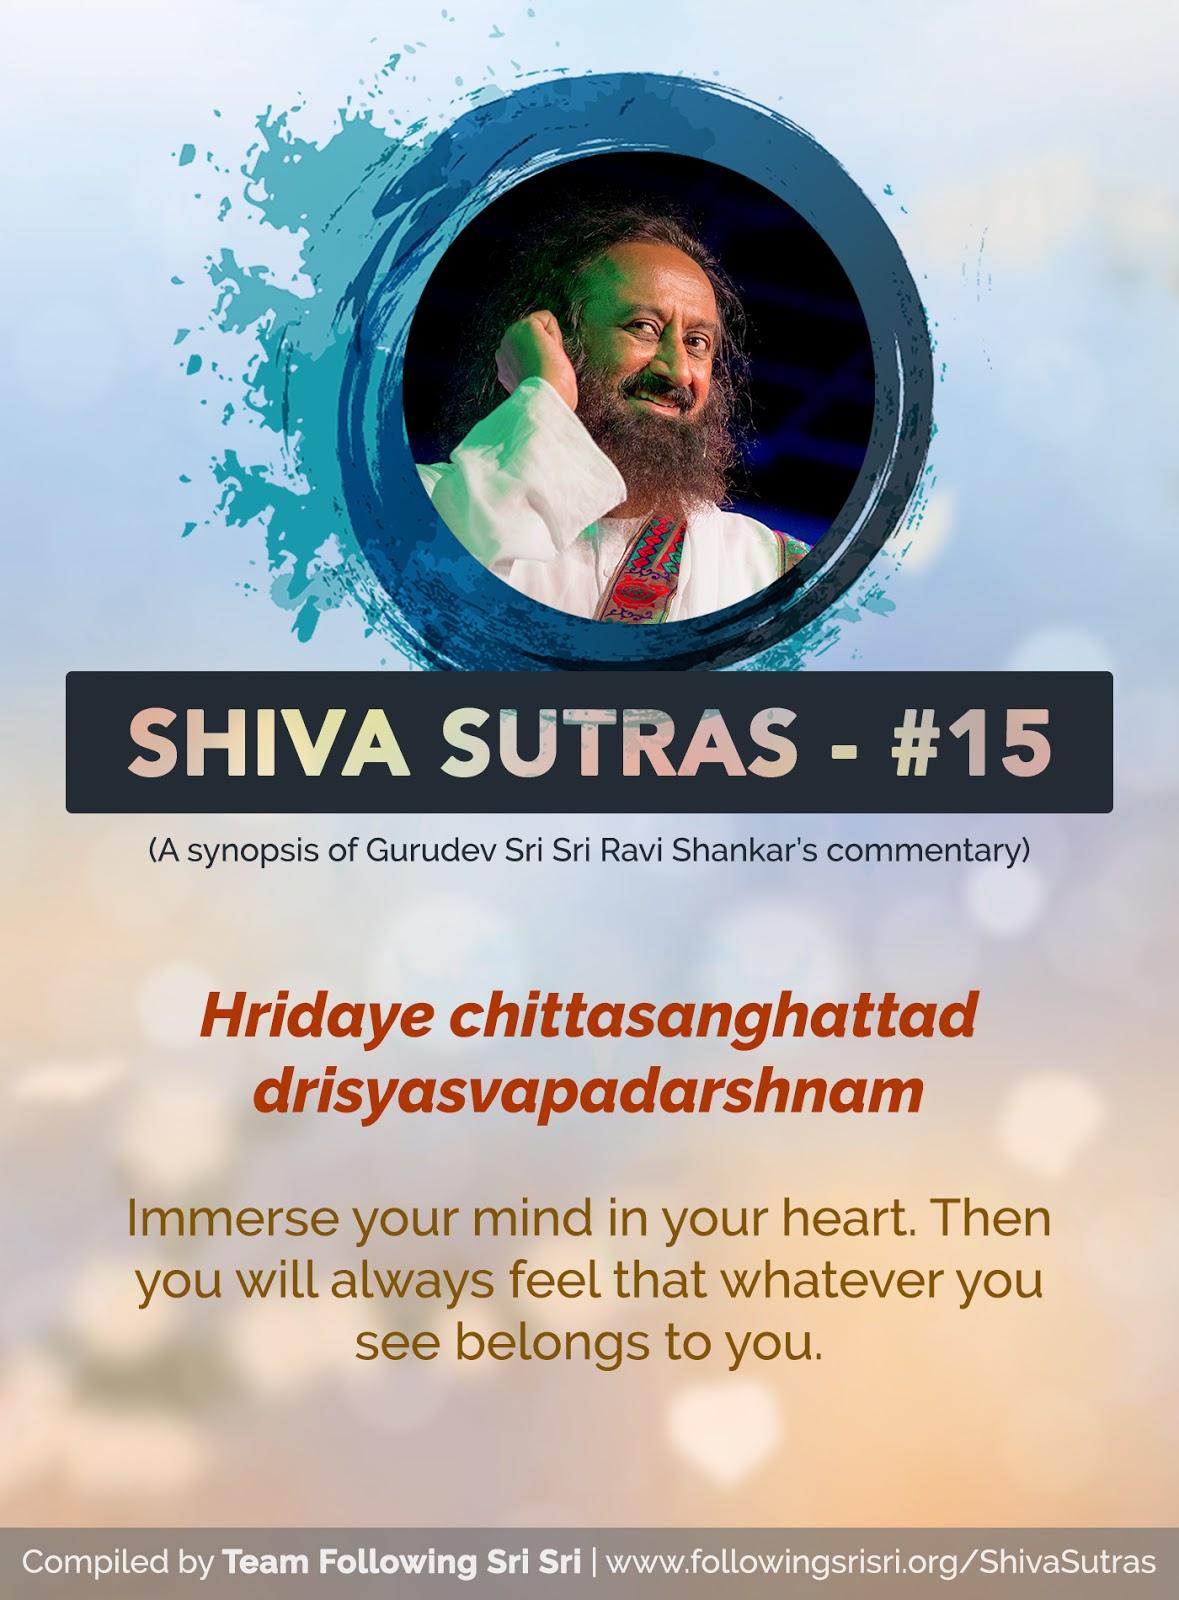 Shiva Sutras - Sutra 15